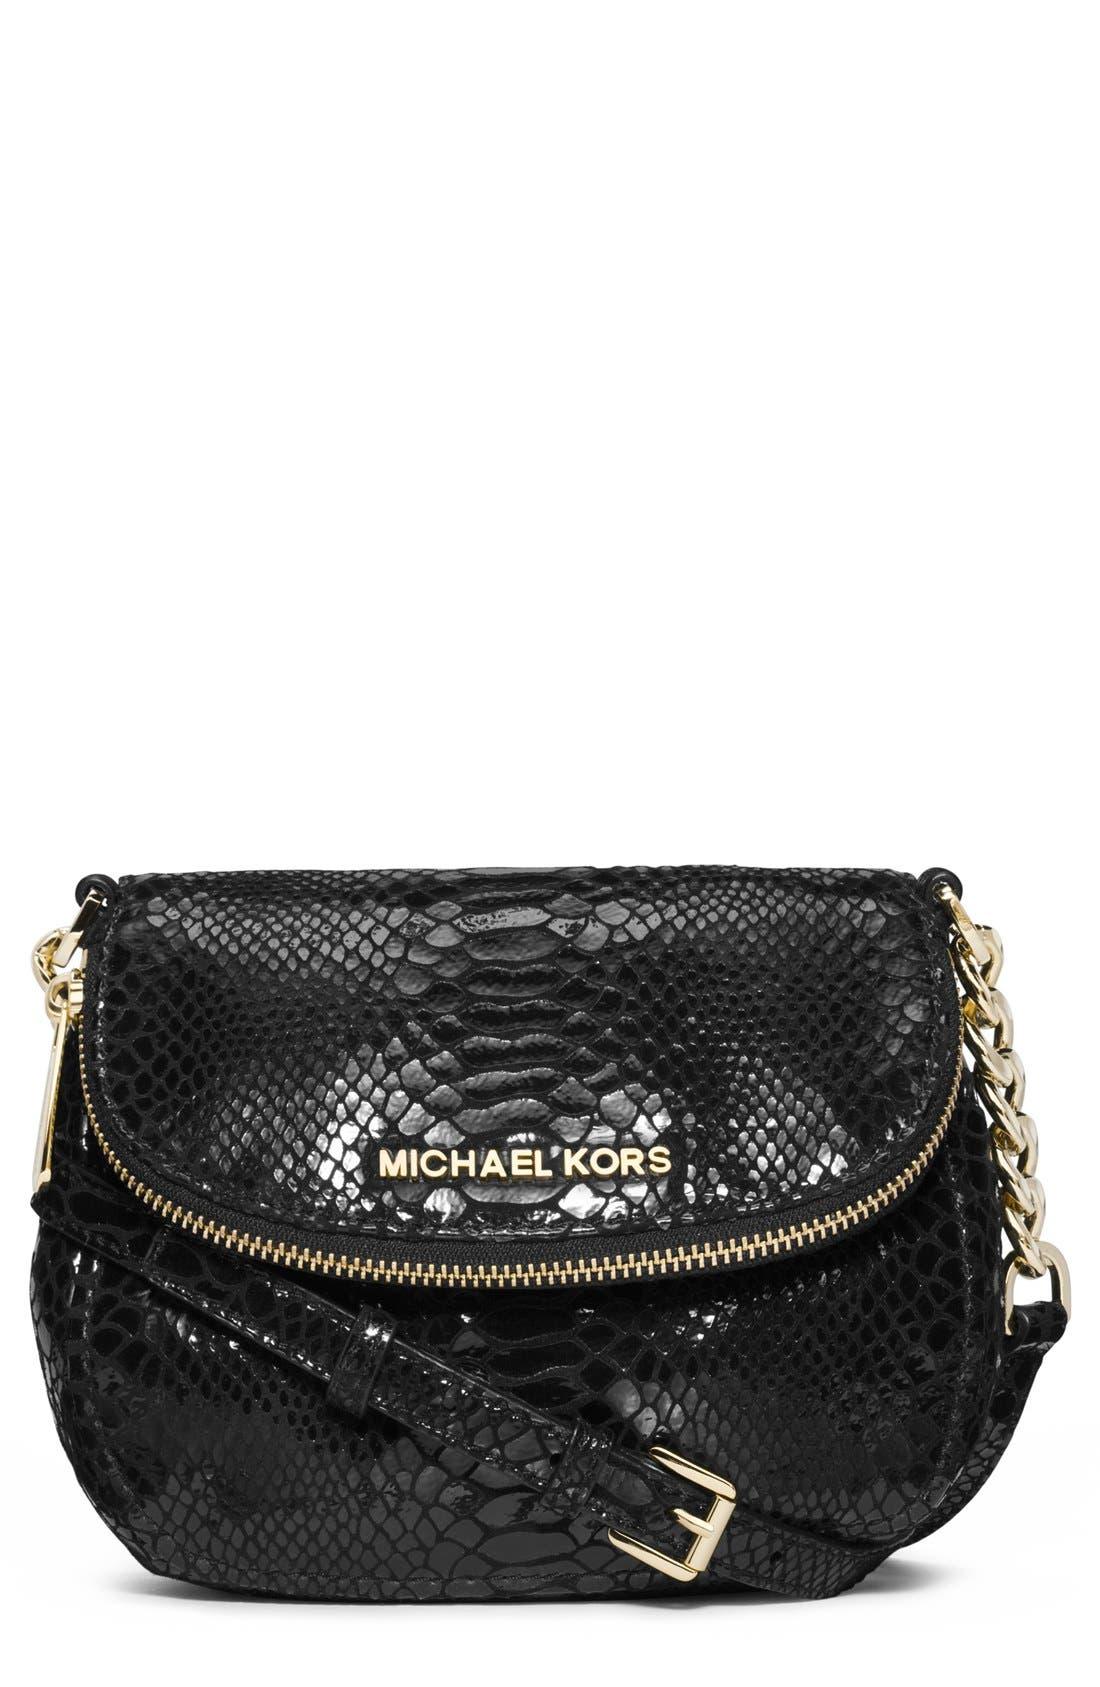 Alternate Image 1 Selected - MICHAEL Michael Kors 'Bedford' Python Embossed Leather Crossbody Bag